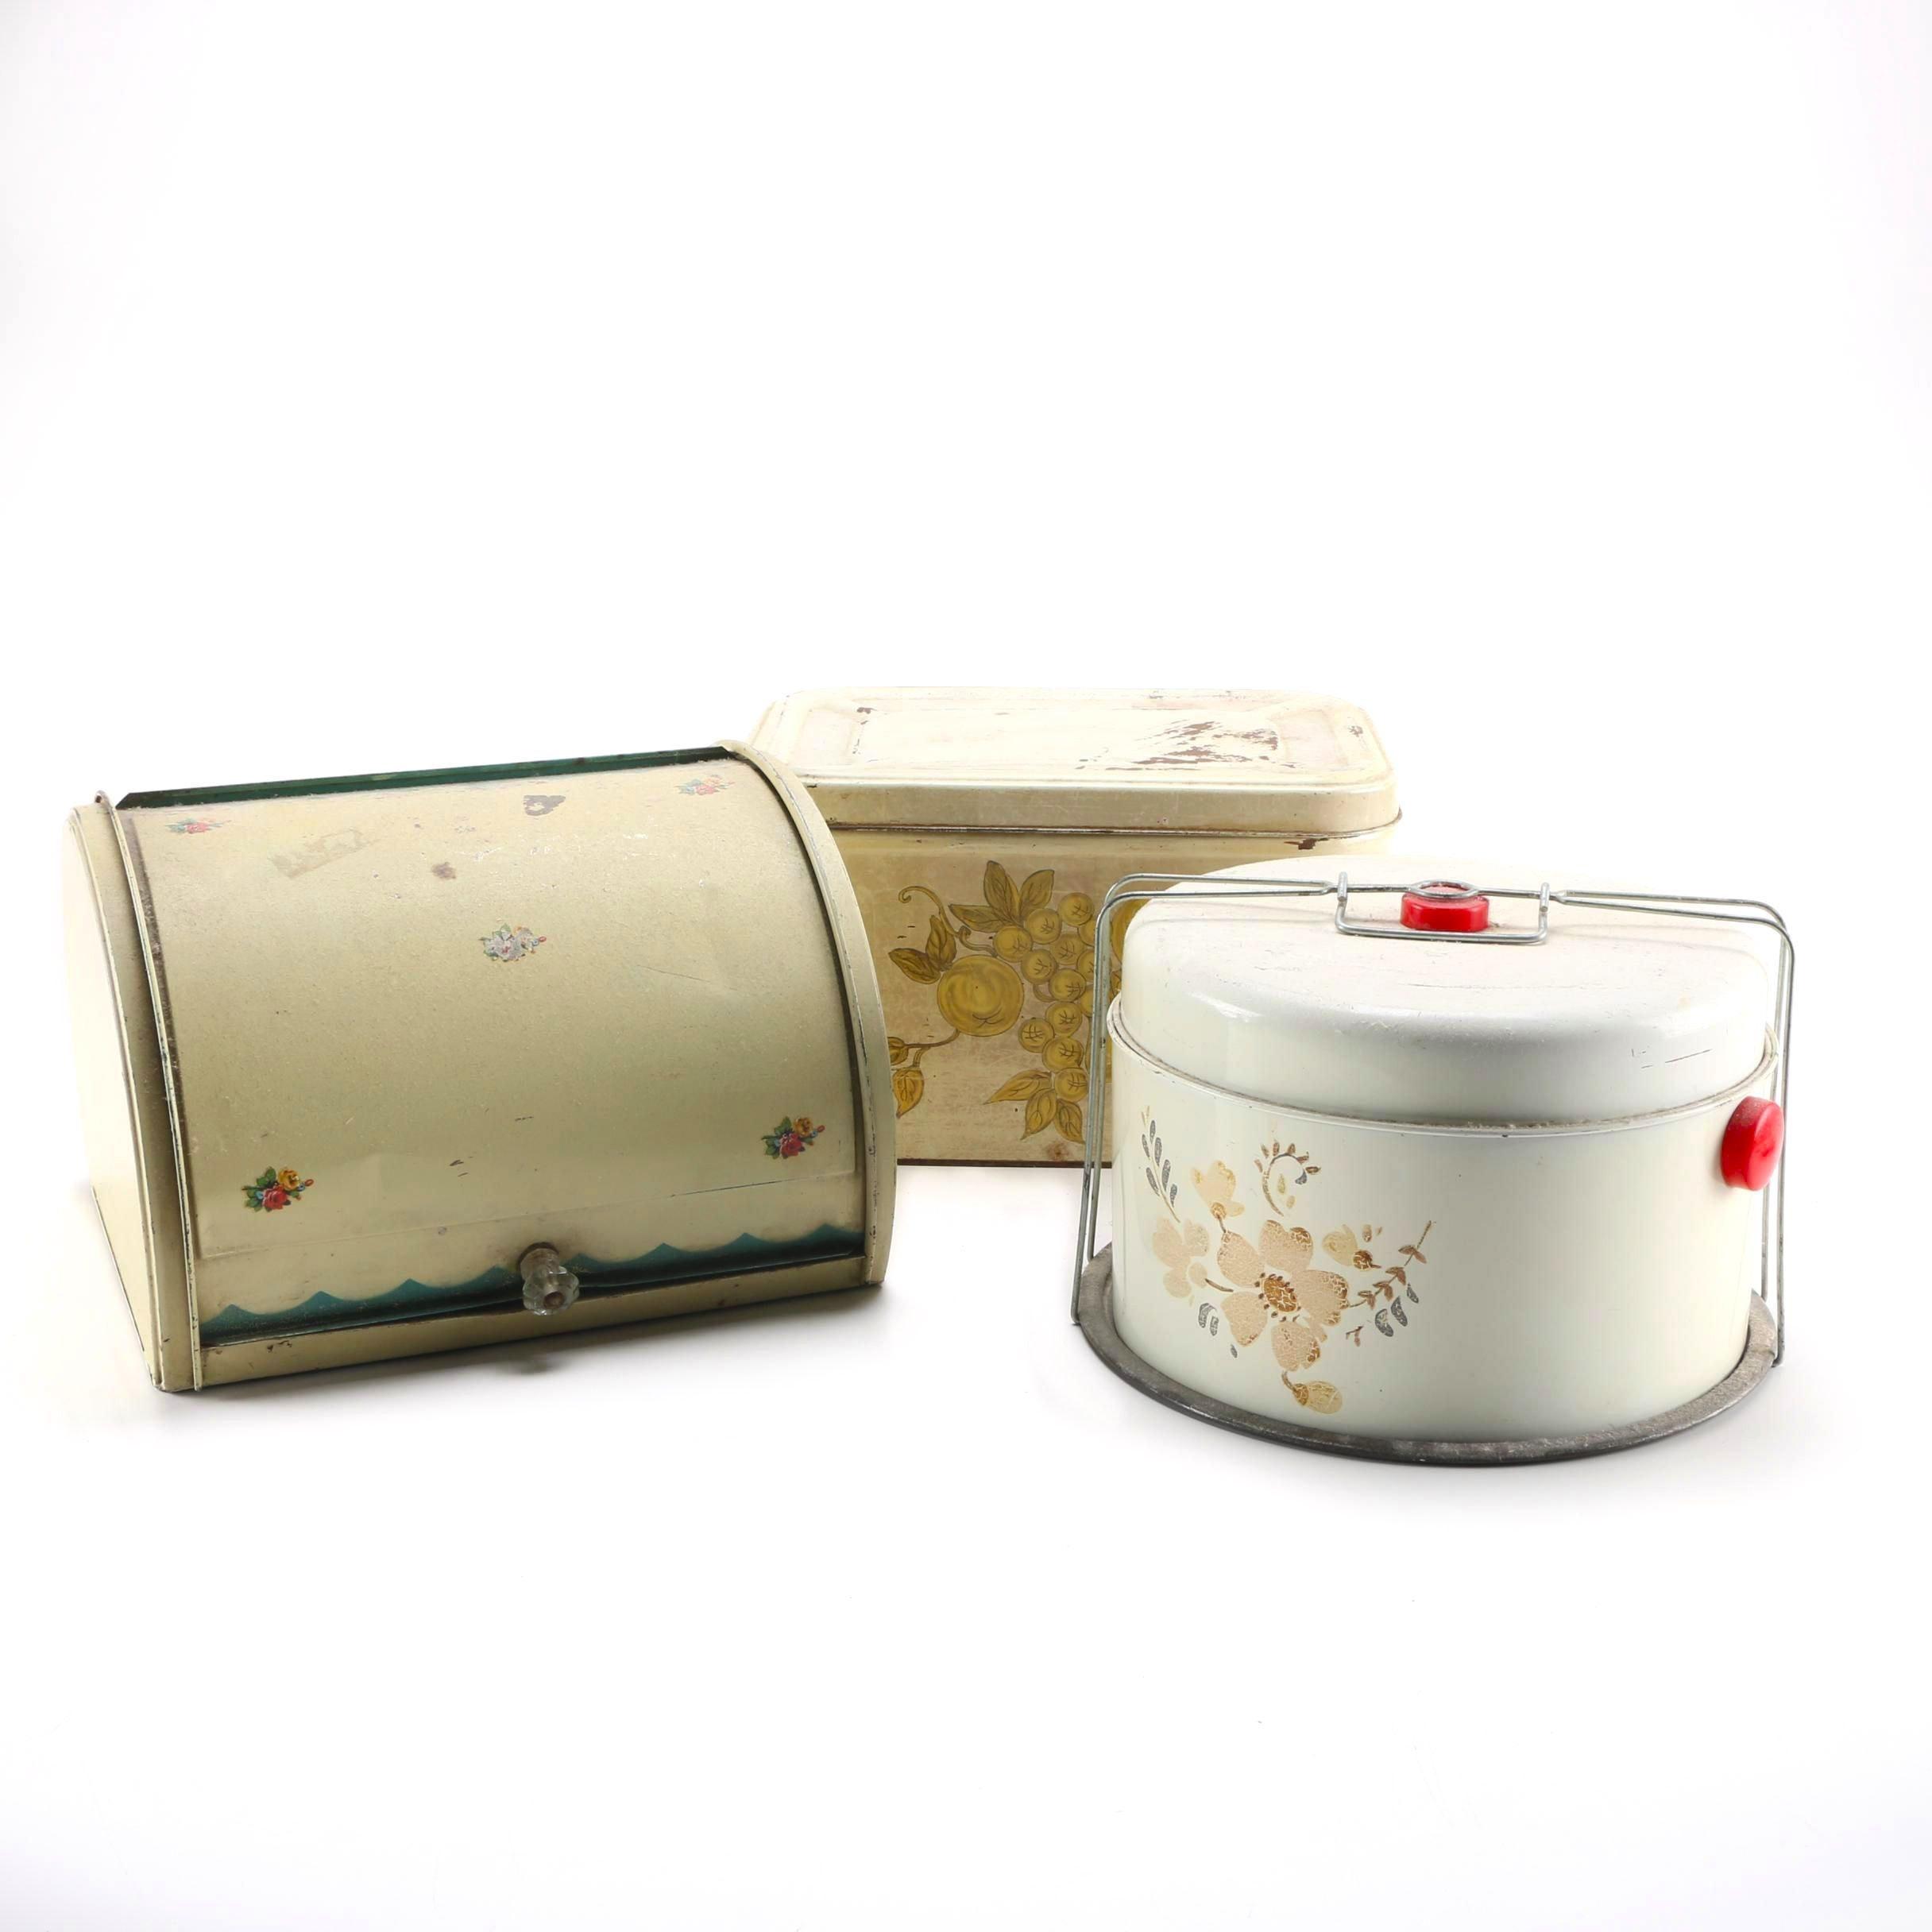 Three Vintage Kitchen Food Storage Containers